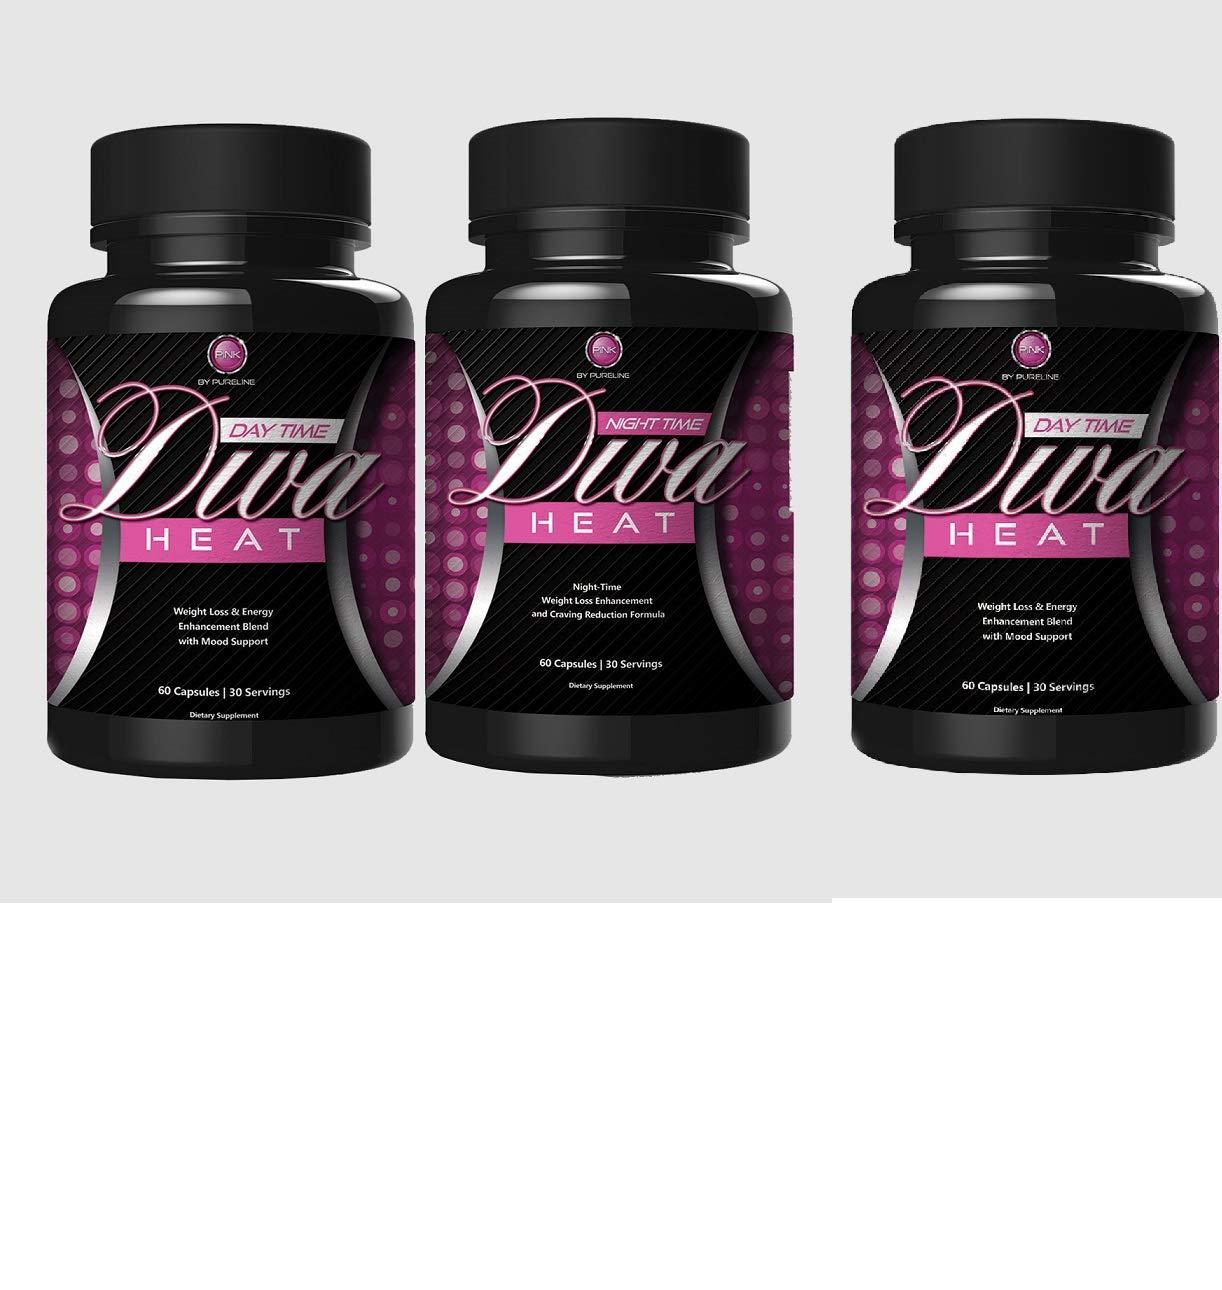 Pureline Nutrition Diva Heat Night Time 60 Capsules(Pack of 3)